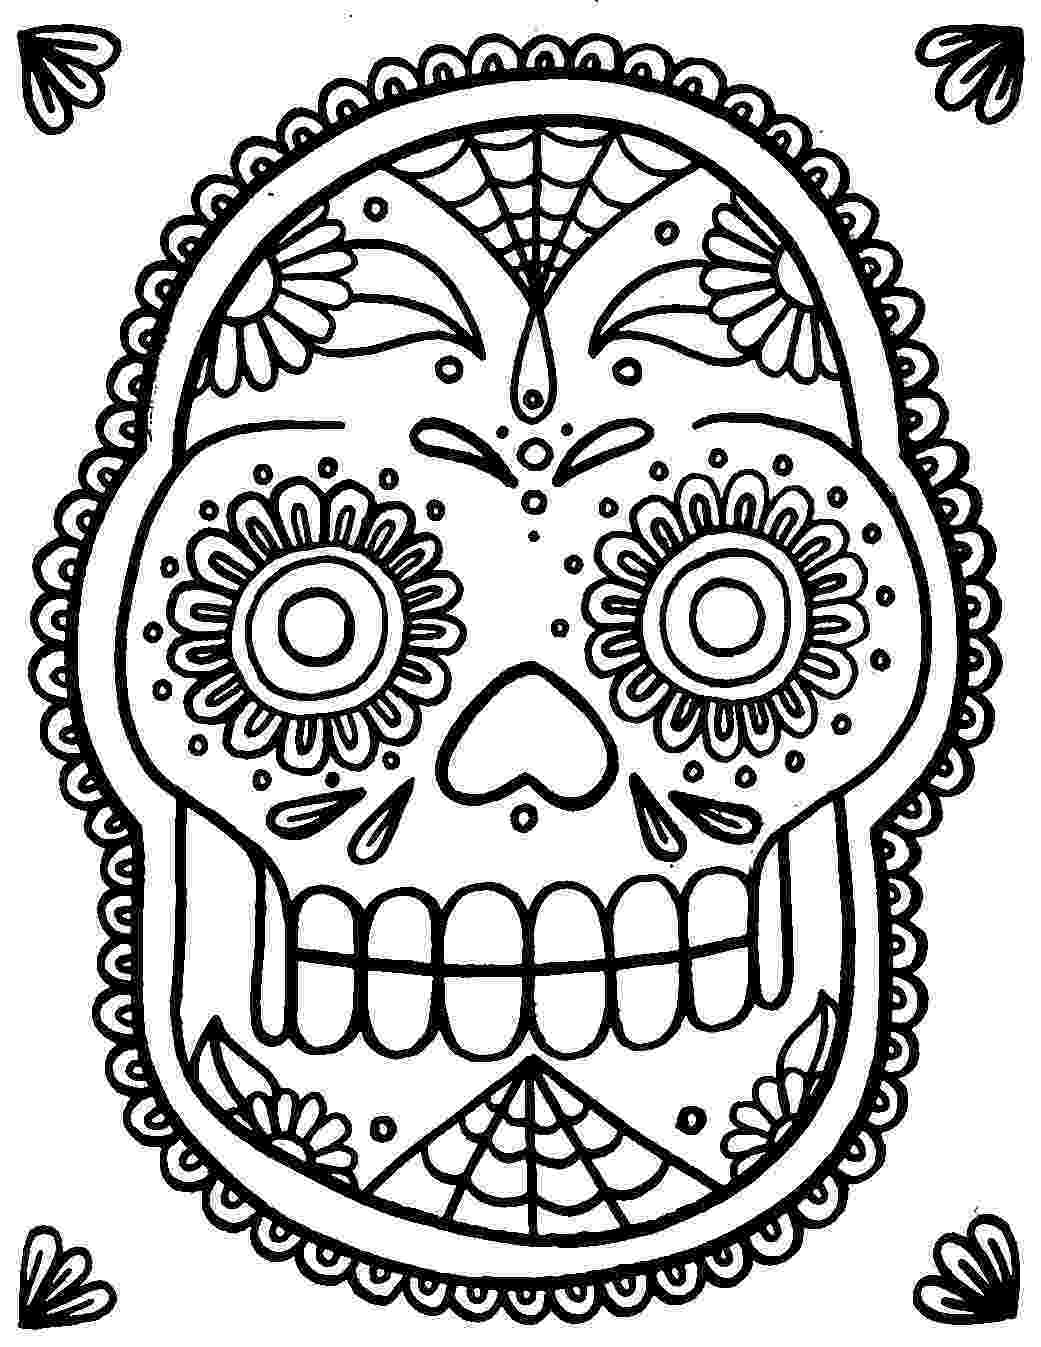 sugar skulls pictures sugar skull coloring page coloring home skulls sugar pictures